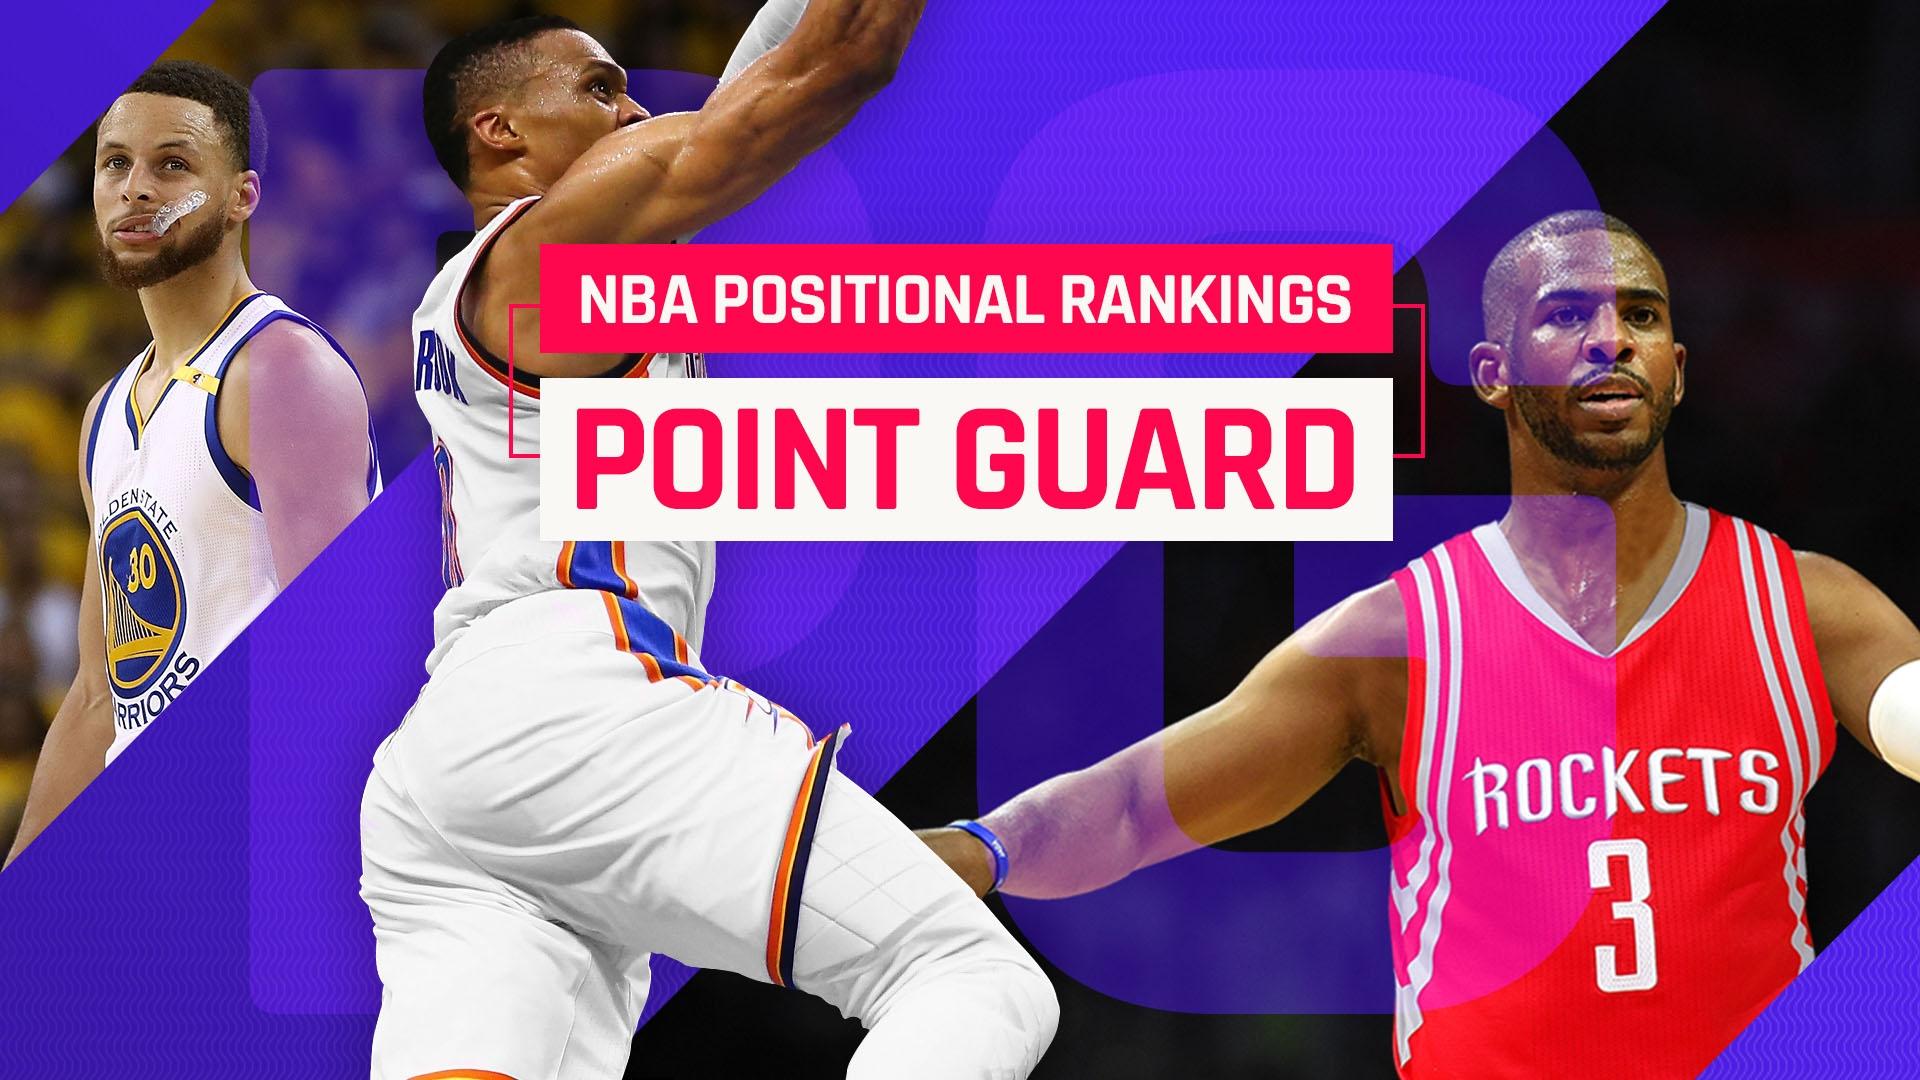 Curry-westbrook-paul-point-guard-rankings-ftr-091917jpg_1dwlj99nz9gs91e6800im871u4